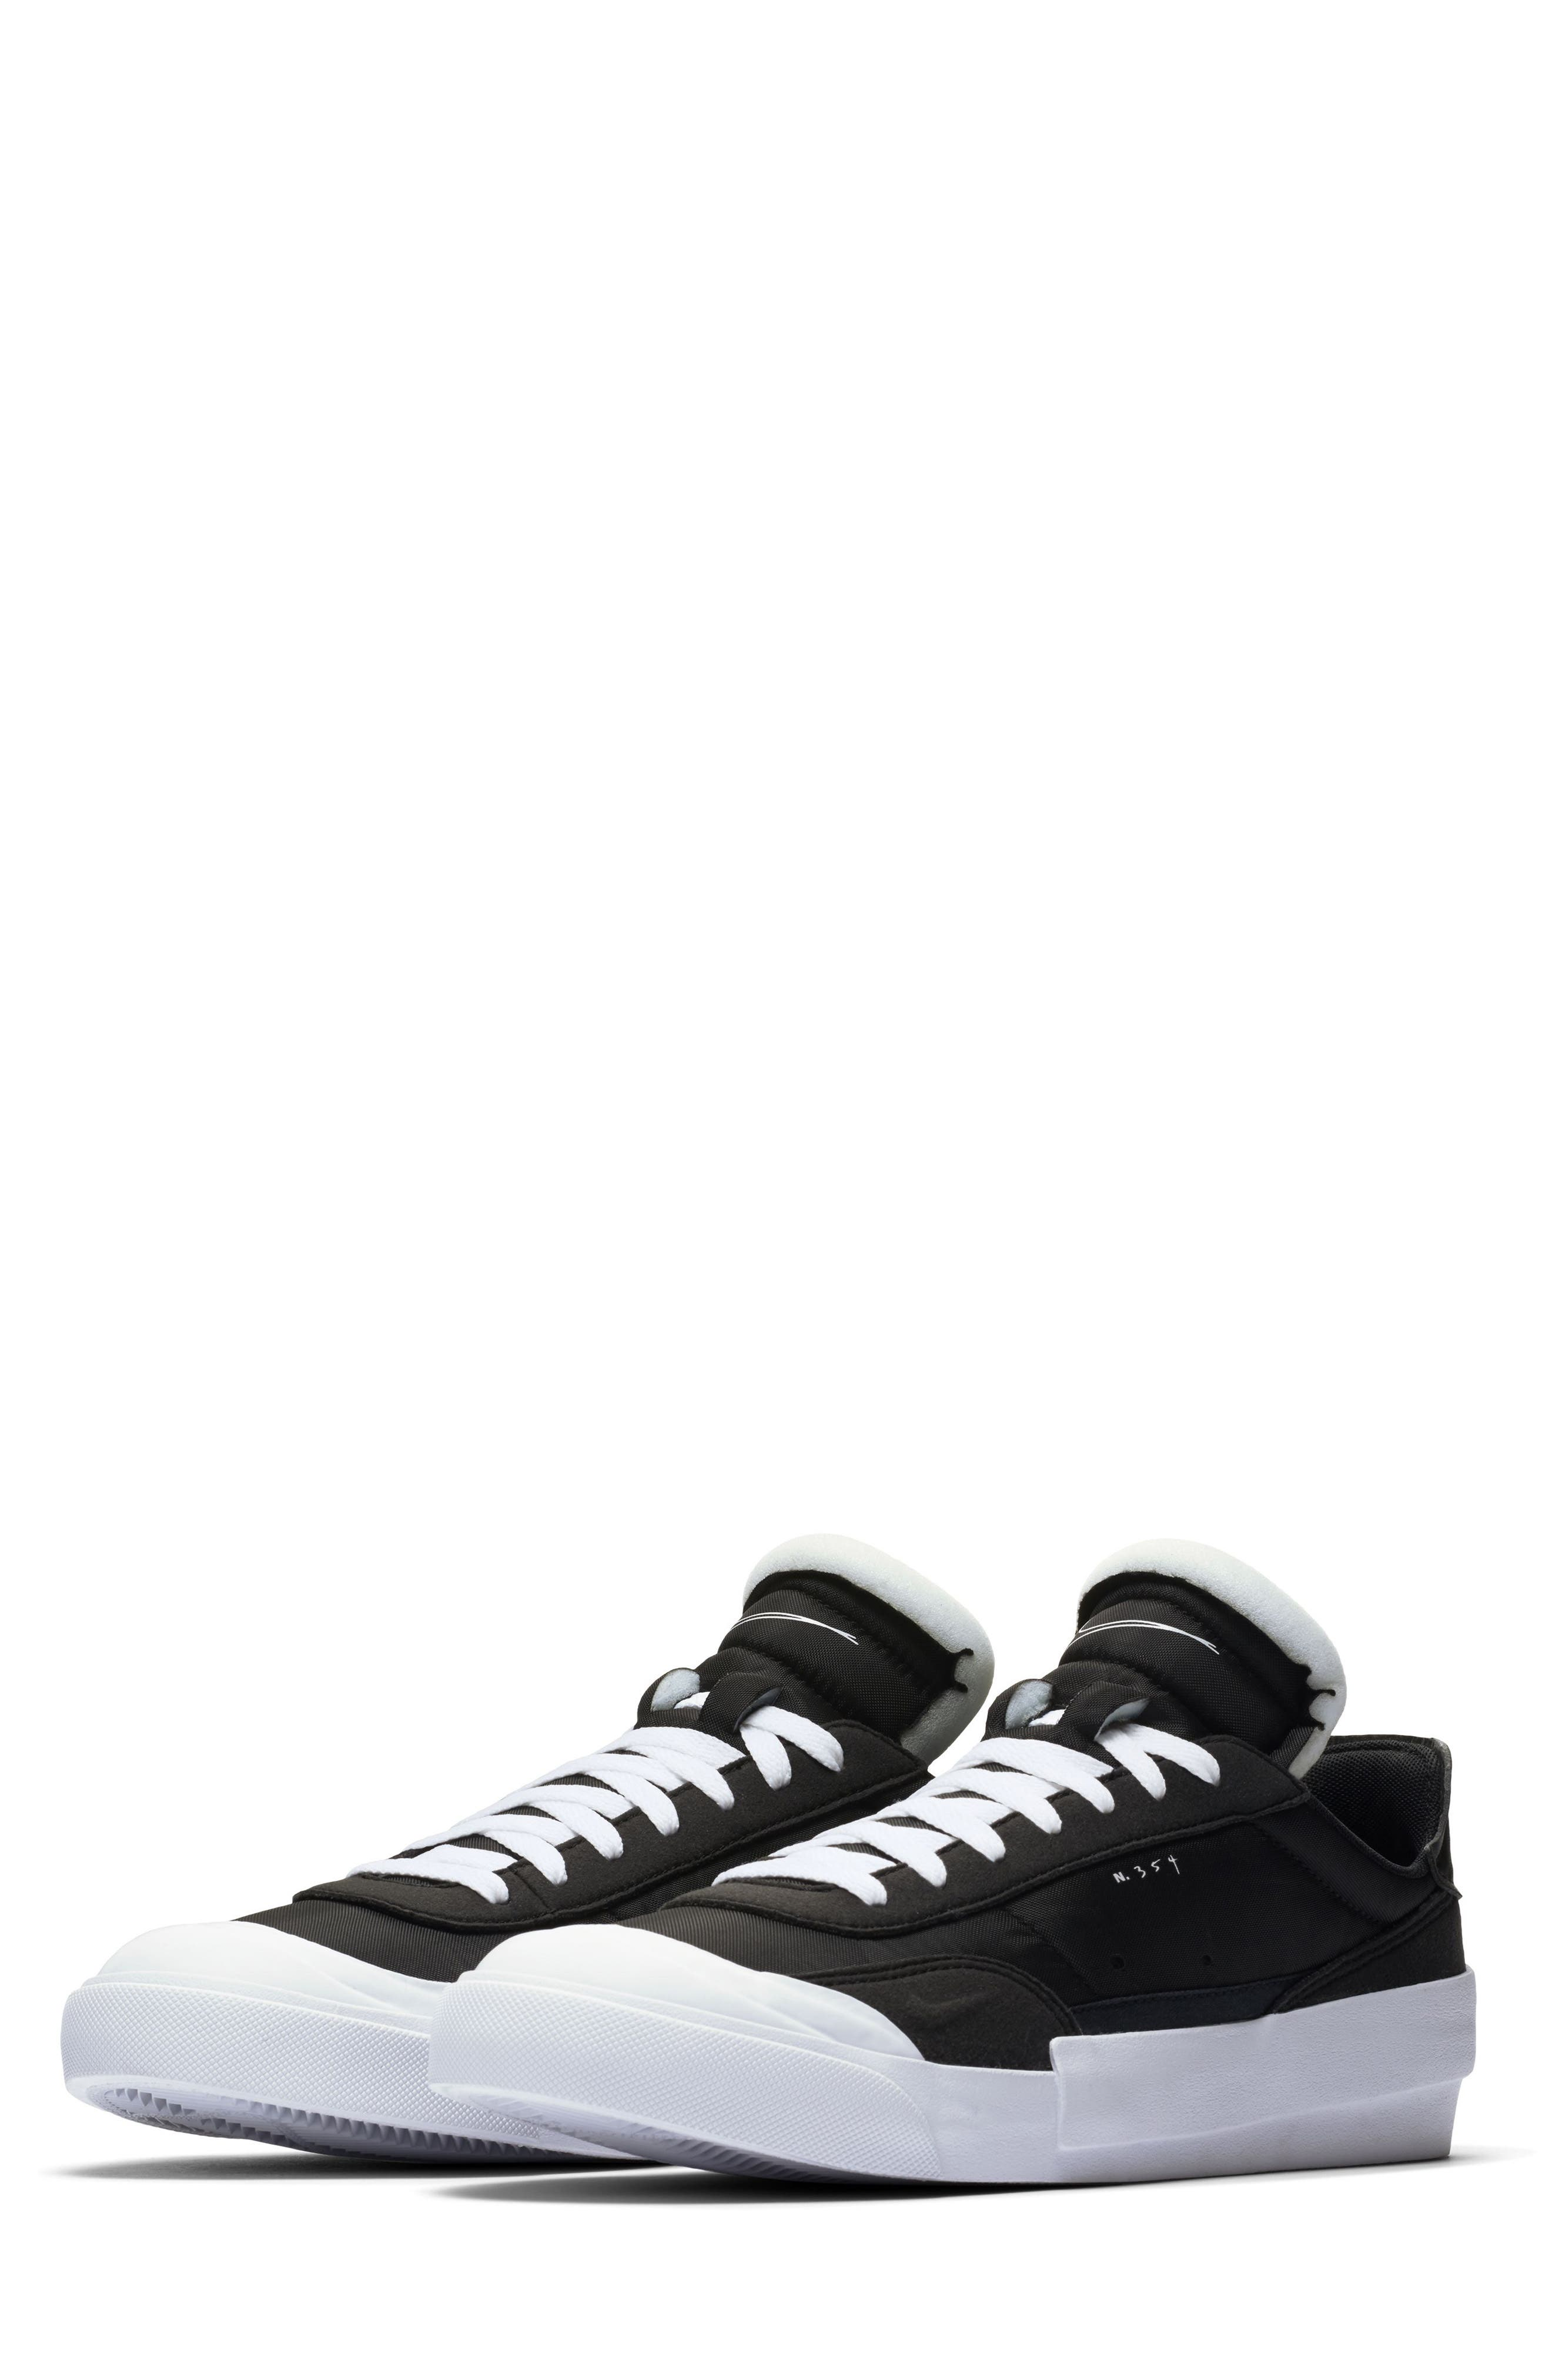 Nike Drop-Type LX Sneaker (Men)   Nordstrom